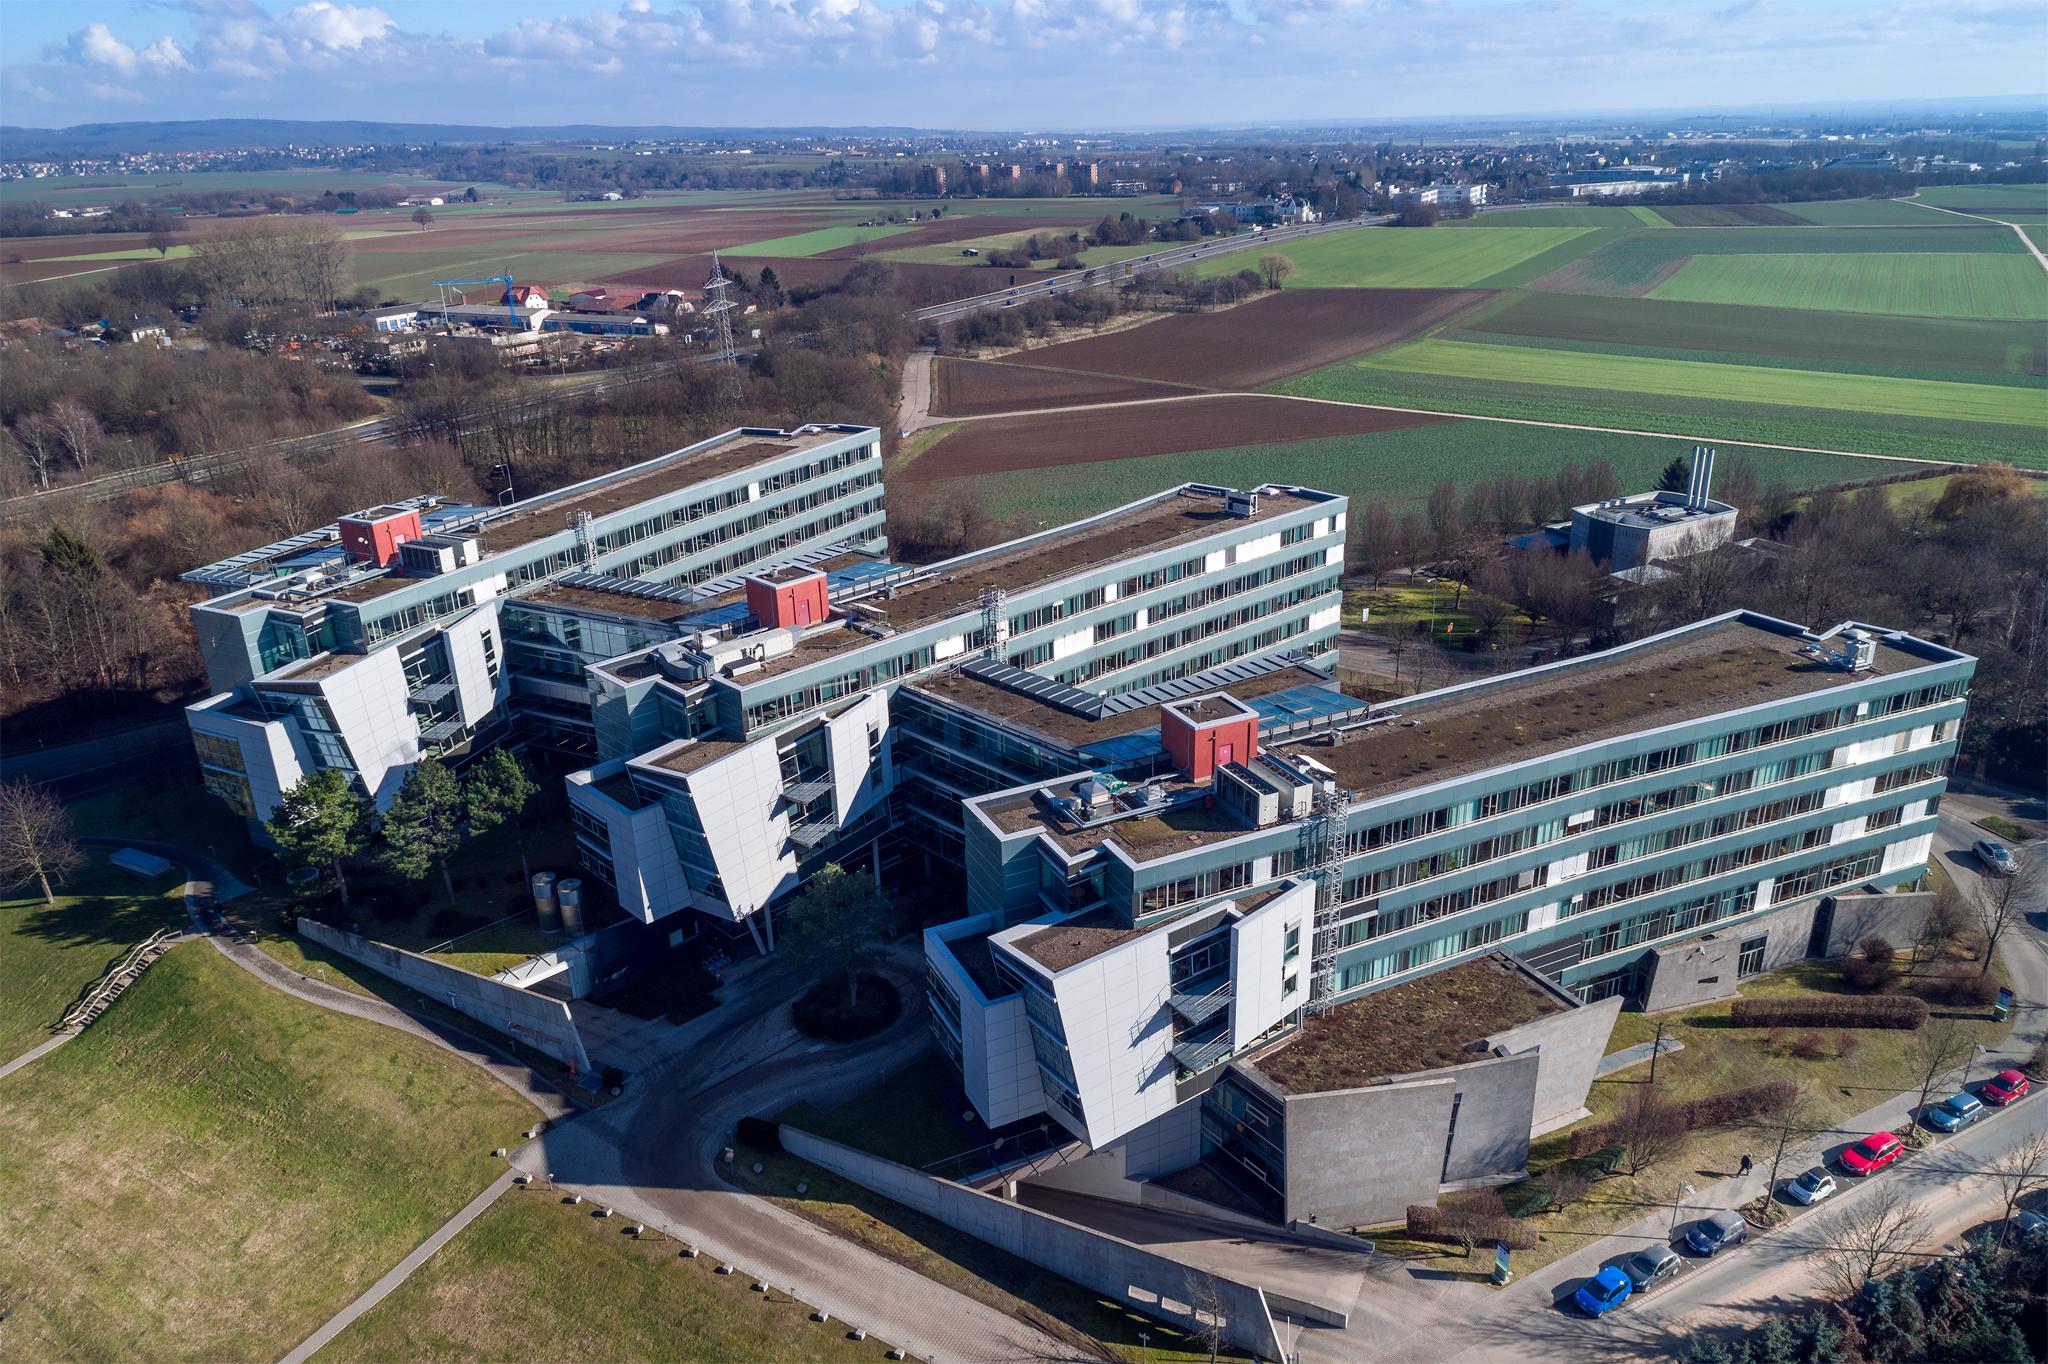 Luftaufnahme-.jpg